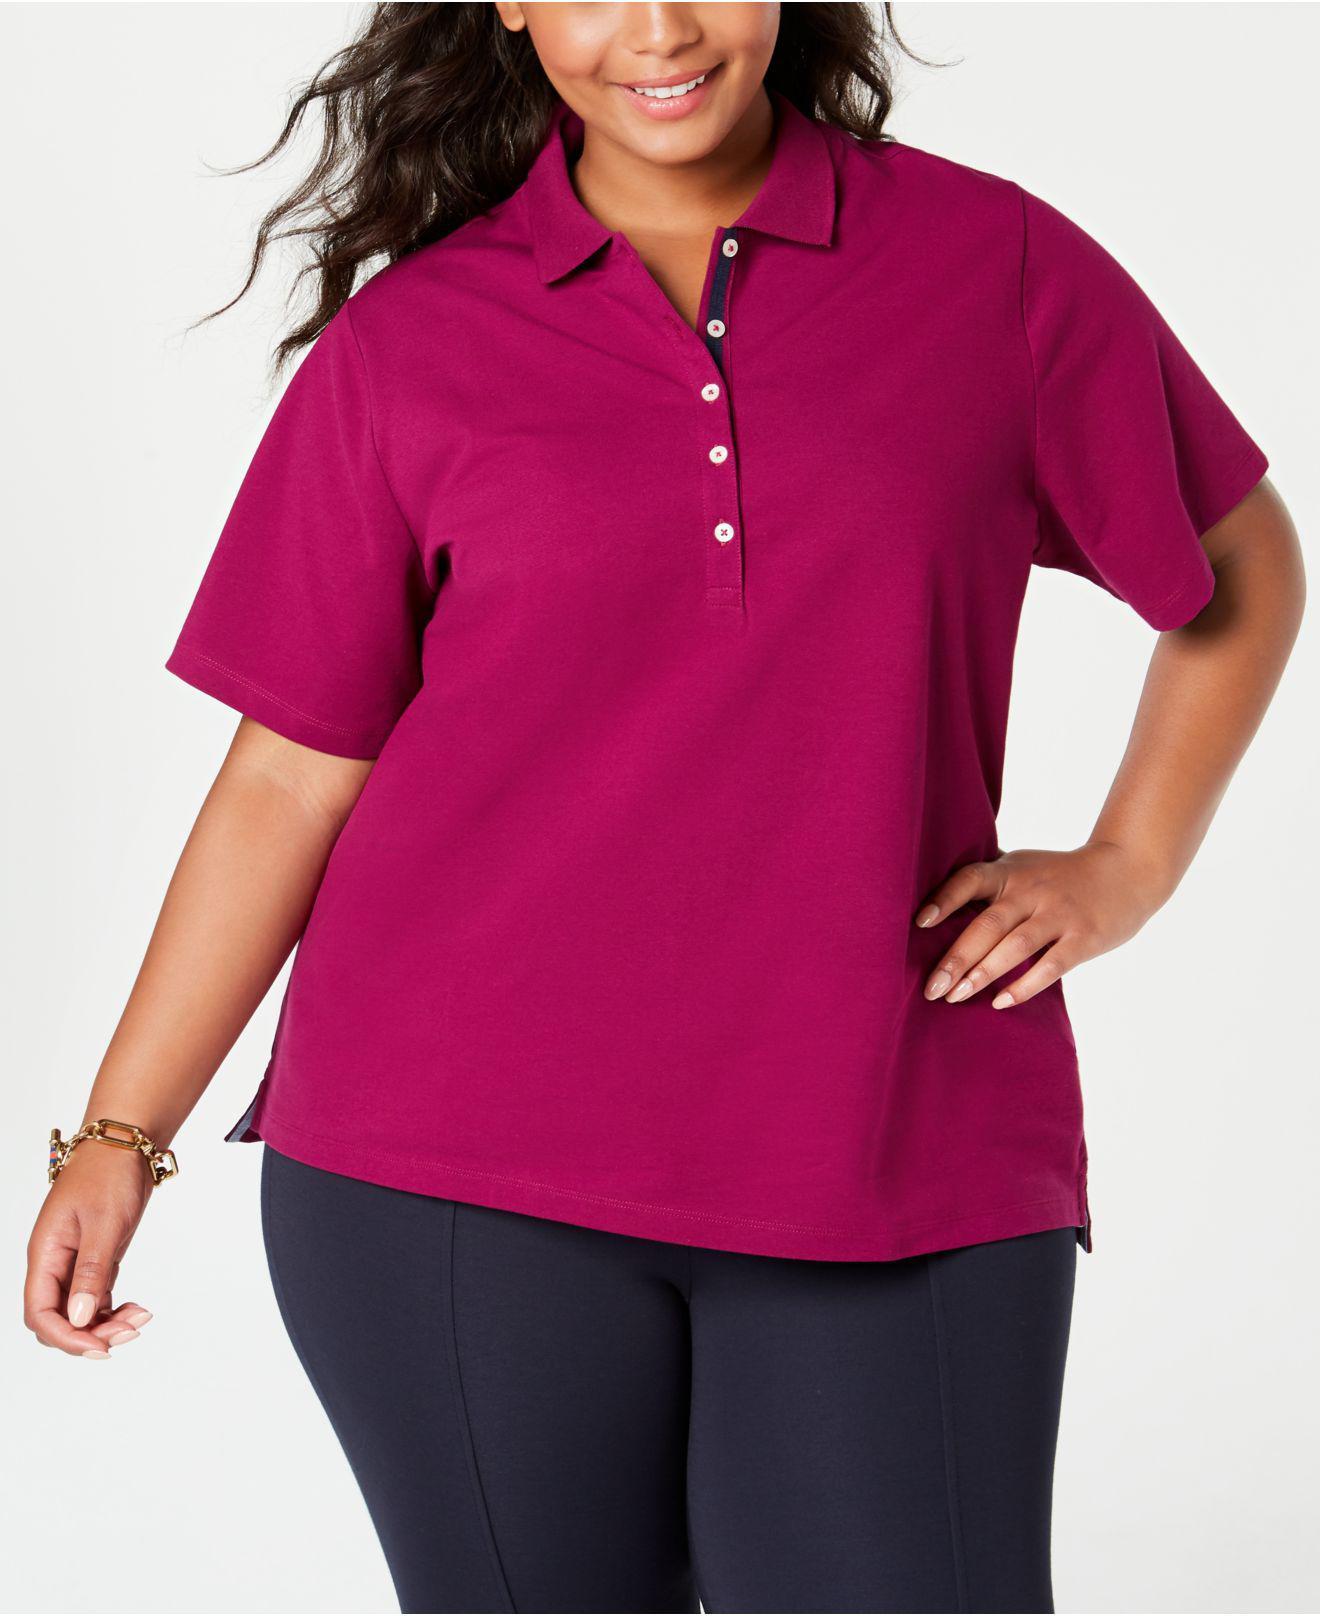 ef73961465f40 Tommy Hilfiger. Women s Plus Size Short-sleeve Polo Shirt ...